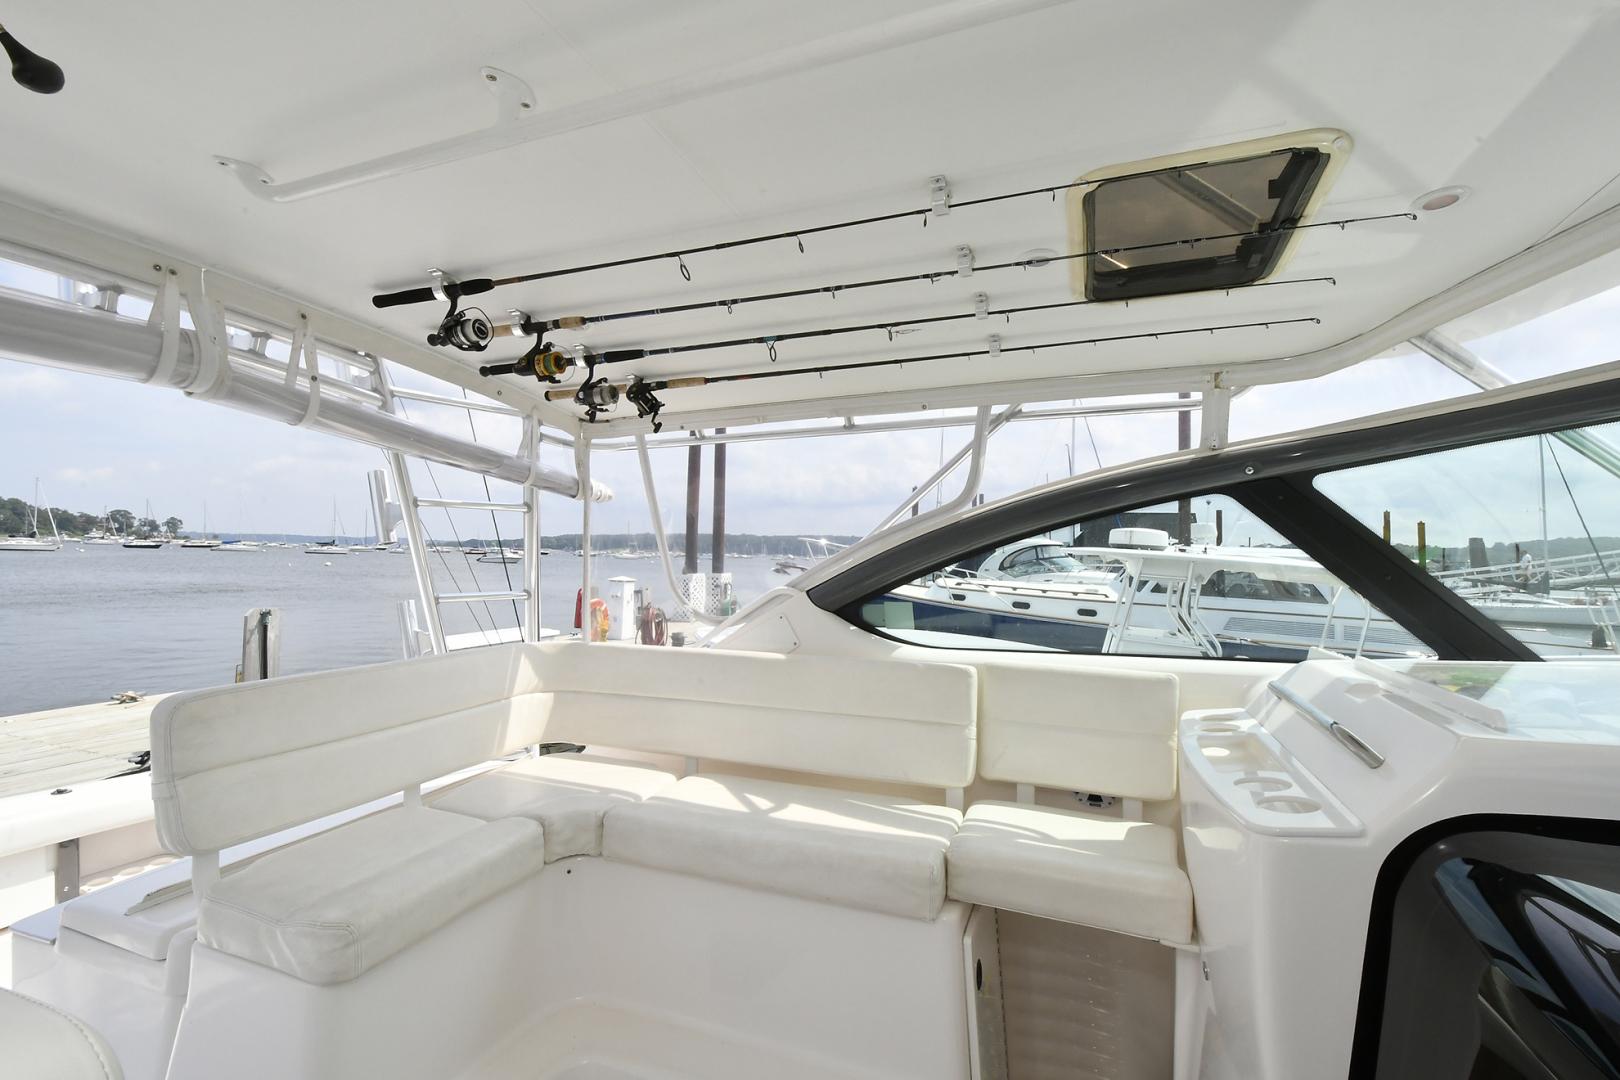 Tiara-3800 Open 2003-Catch 22 Oyster Bay-New York-United States-Companion Seating & Rod Storage-1224913 | Thumbnail